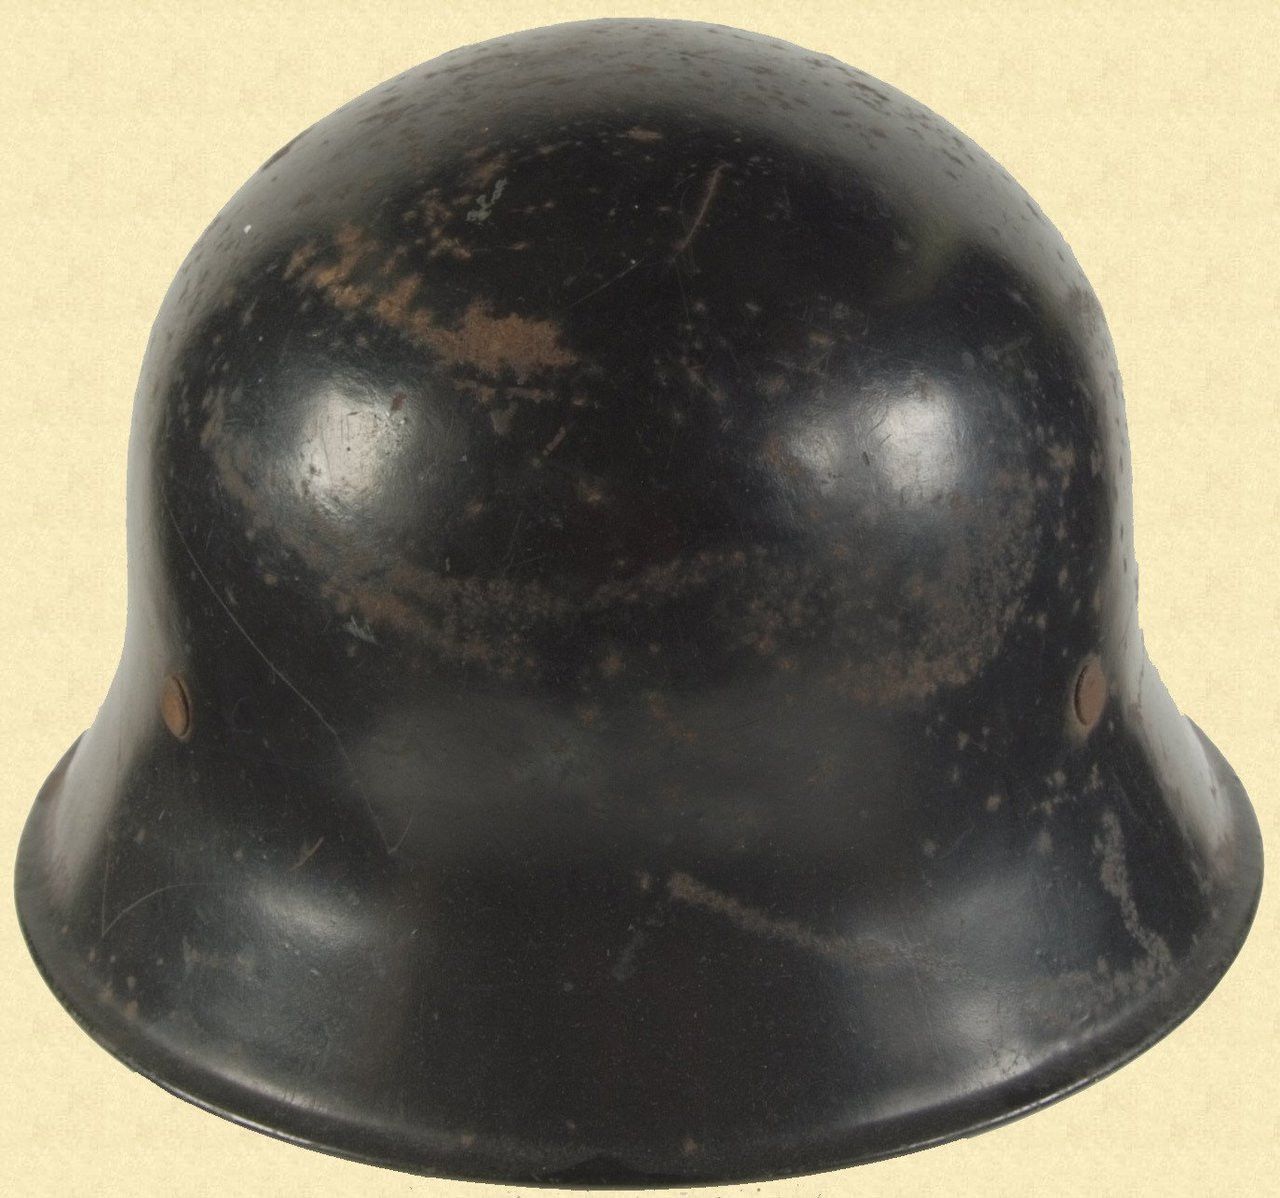 GERMAN WW2 FIRE POLICE HELMET - M2503